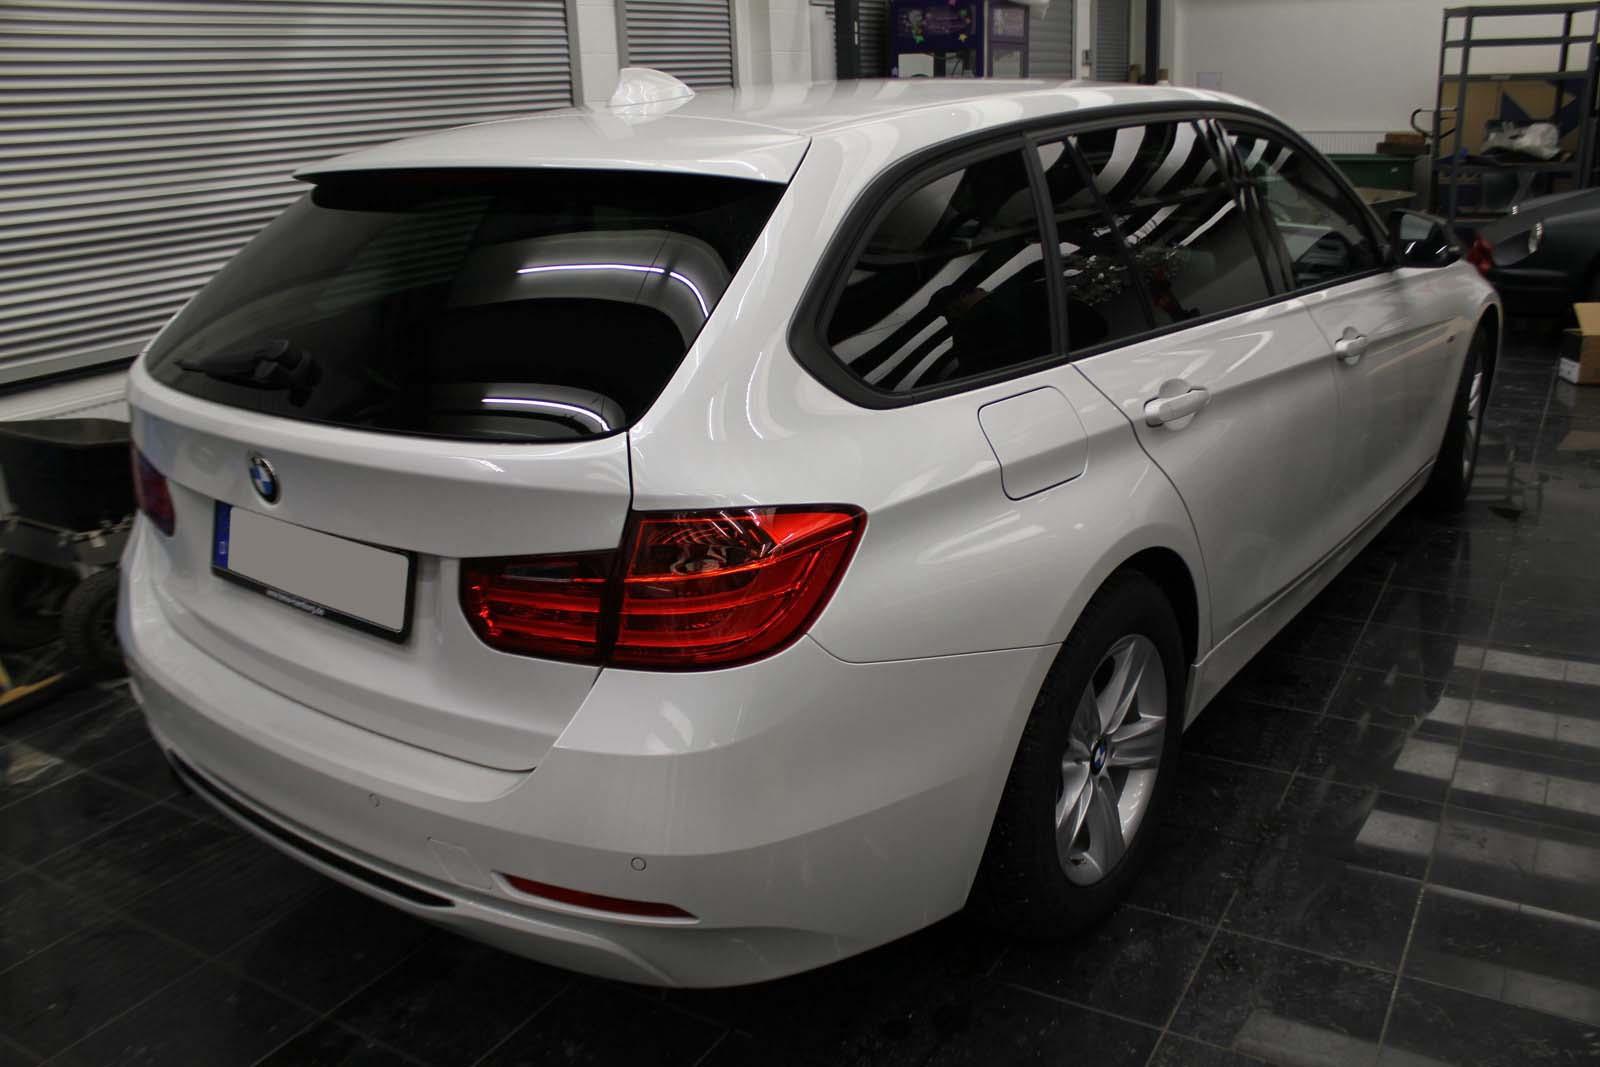 BMW_3ER_RALLYESTREIFEN_WEISS_GRUEN_MATT_MIT_BRANDING_002